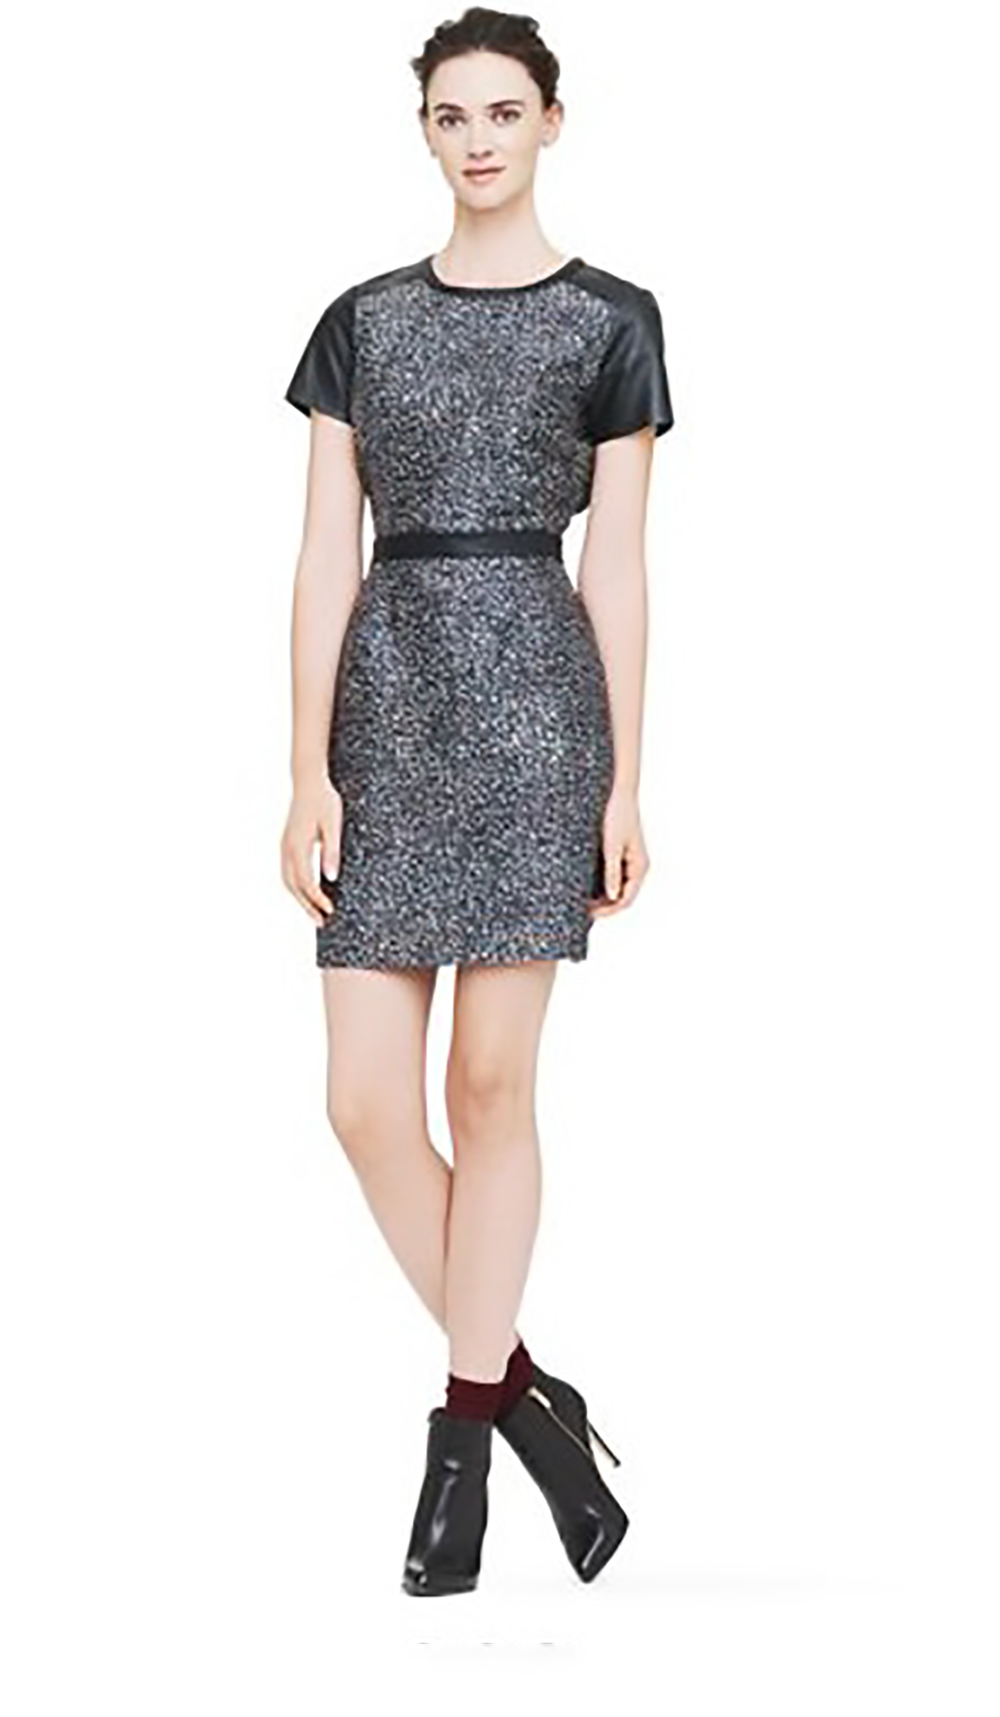 club monaco jillian printed dress short dresses 1500.jpg